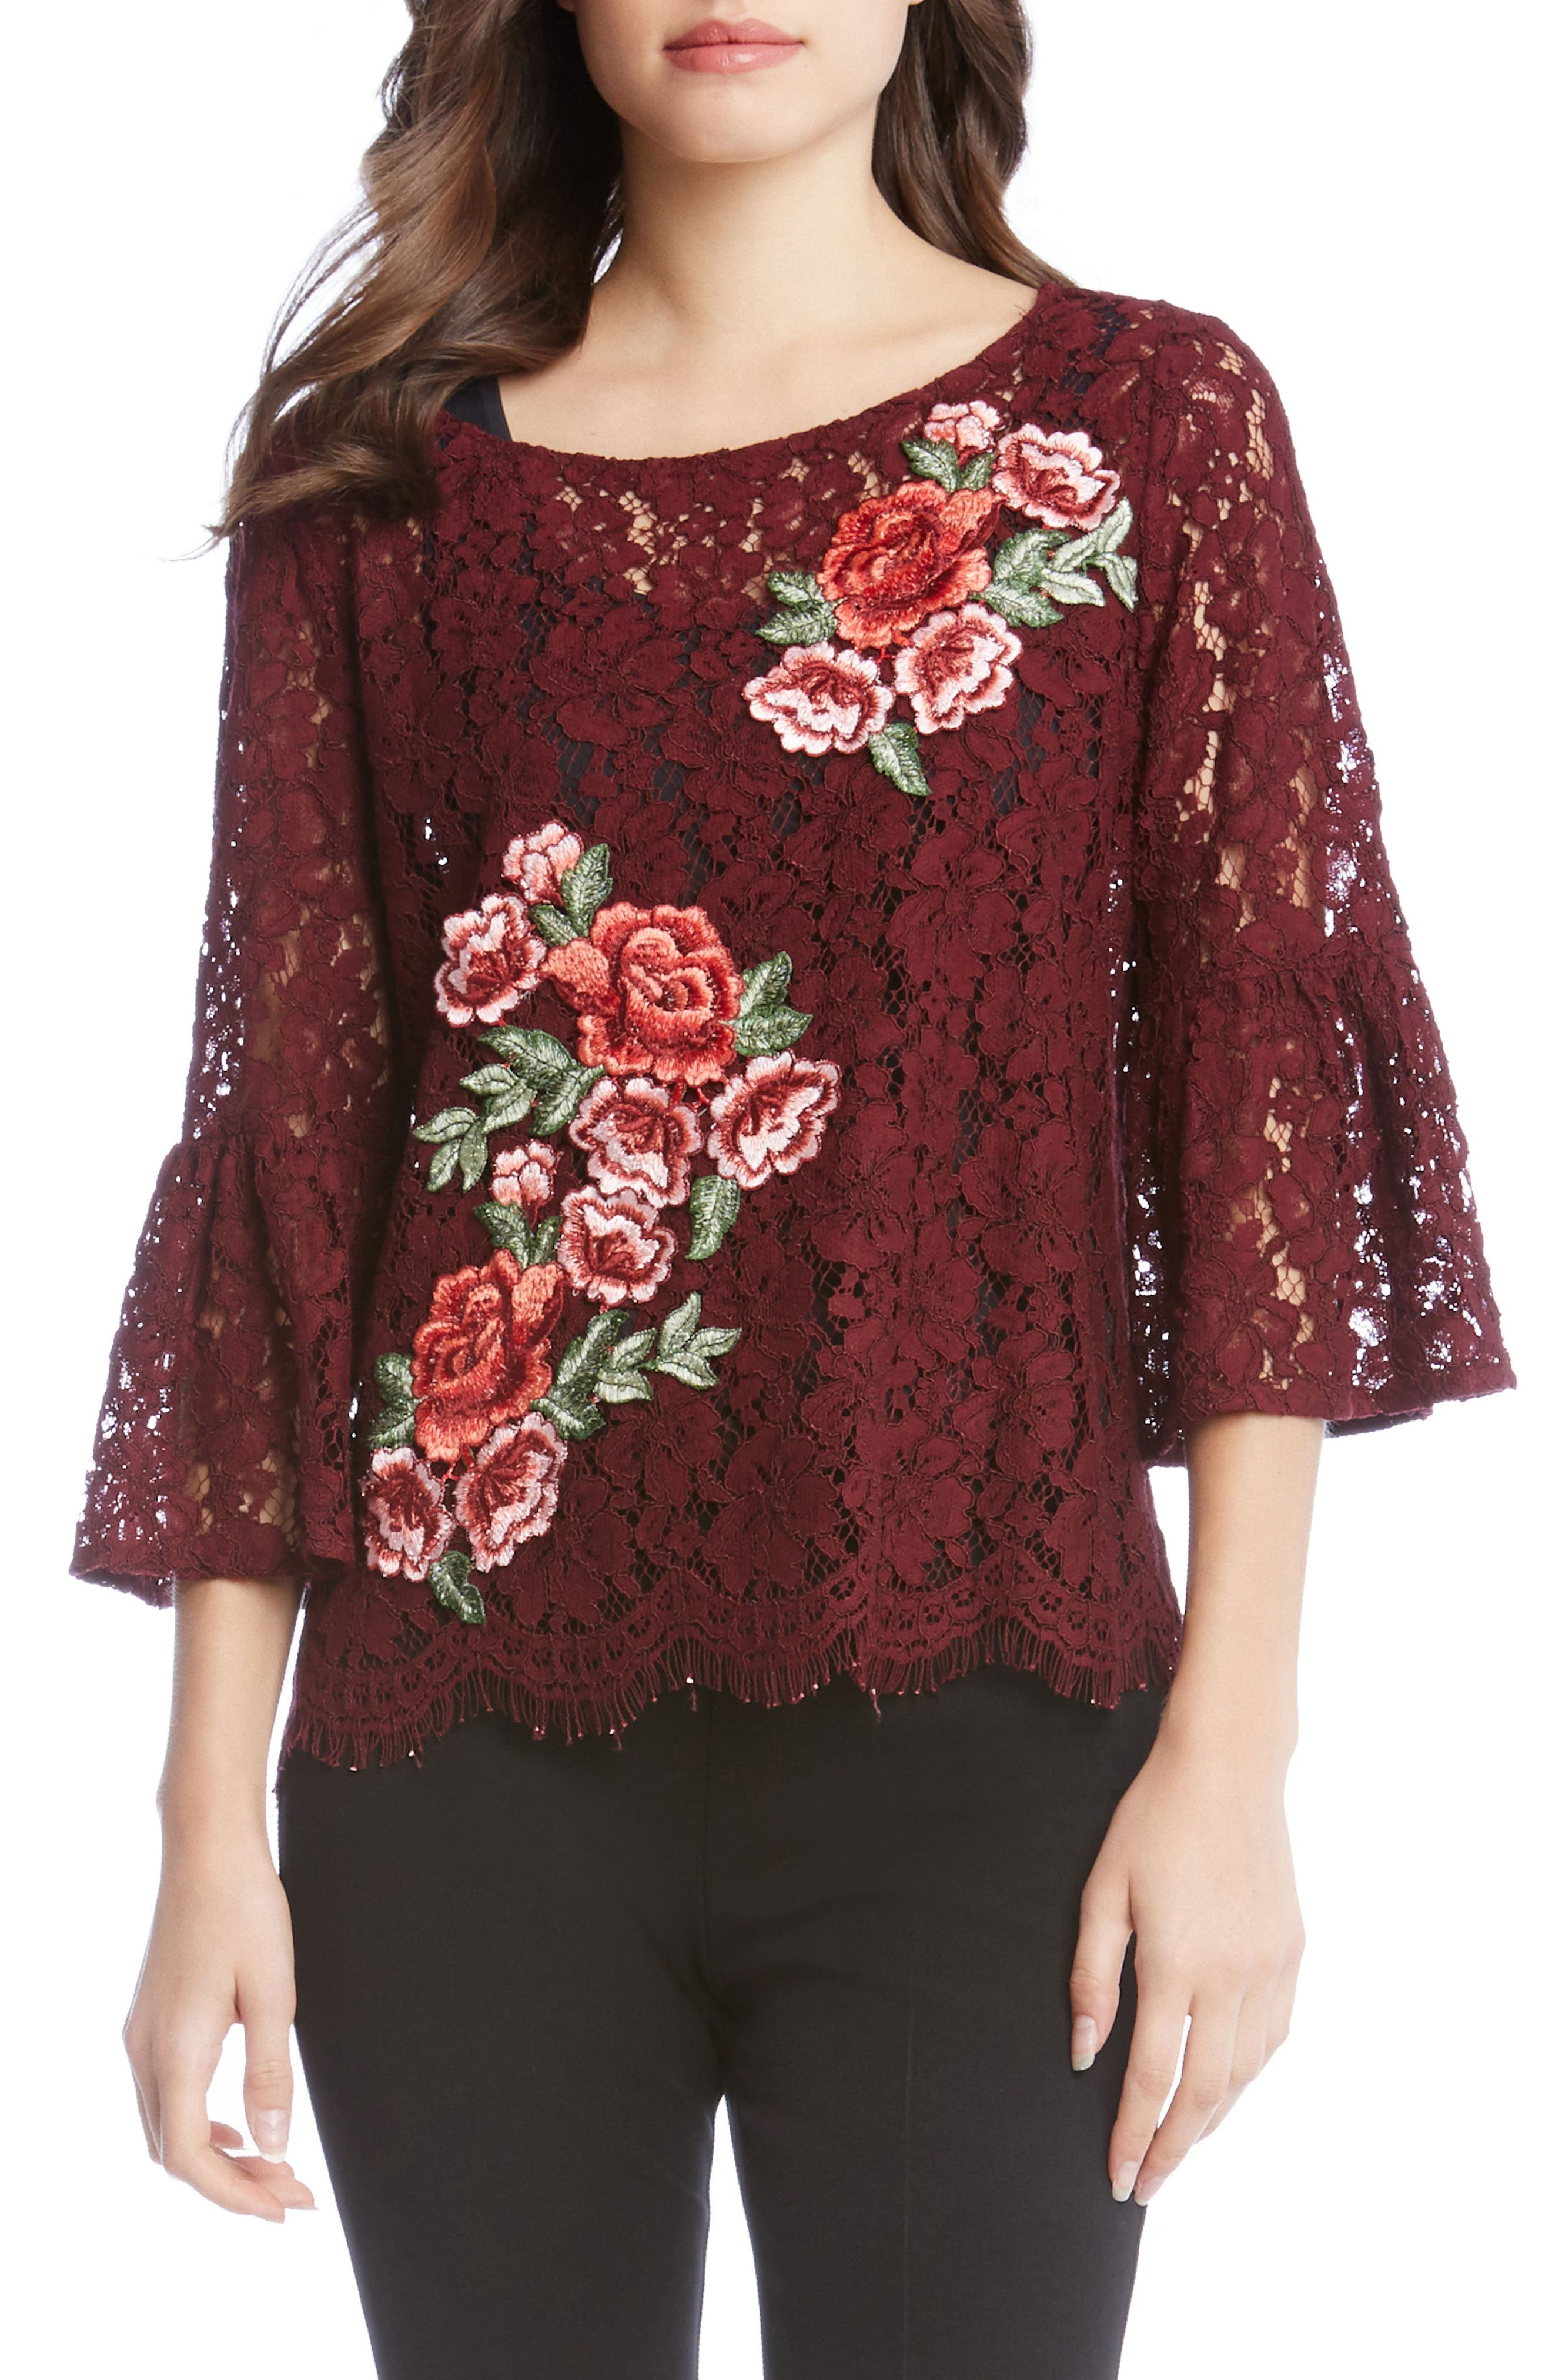 Main Image - Karen Kane Lace Embellished Bell Sleeve Top